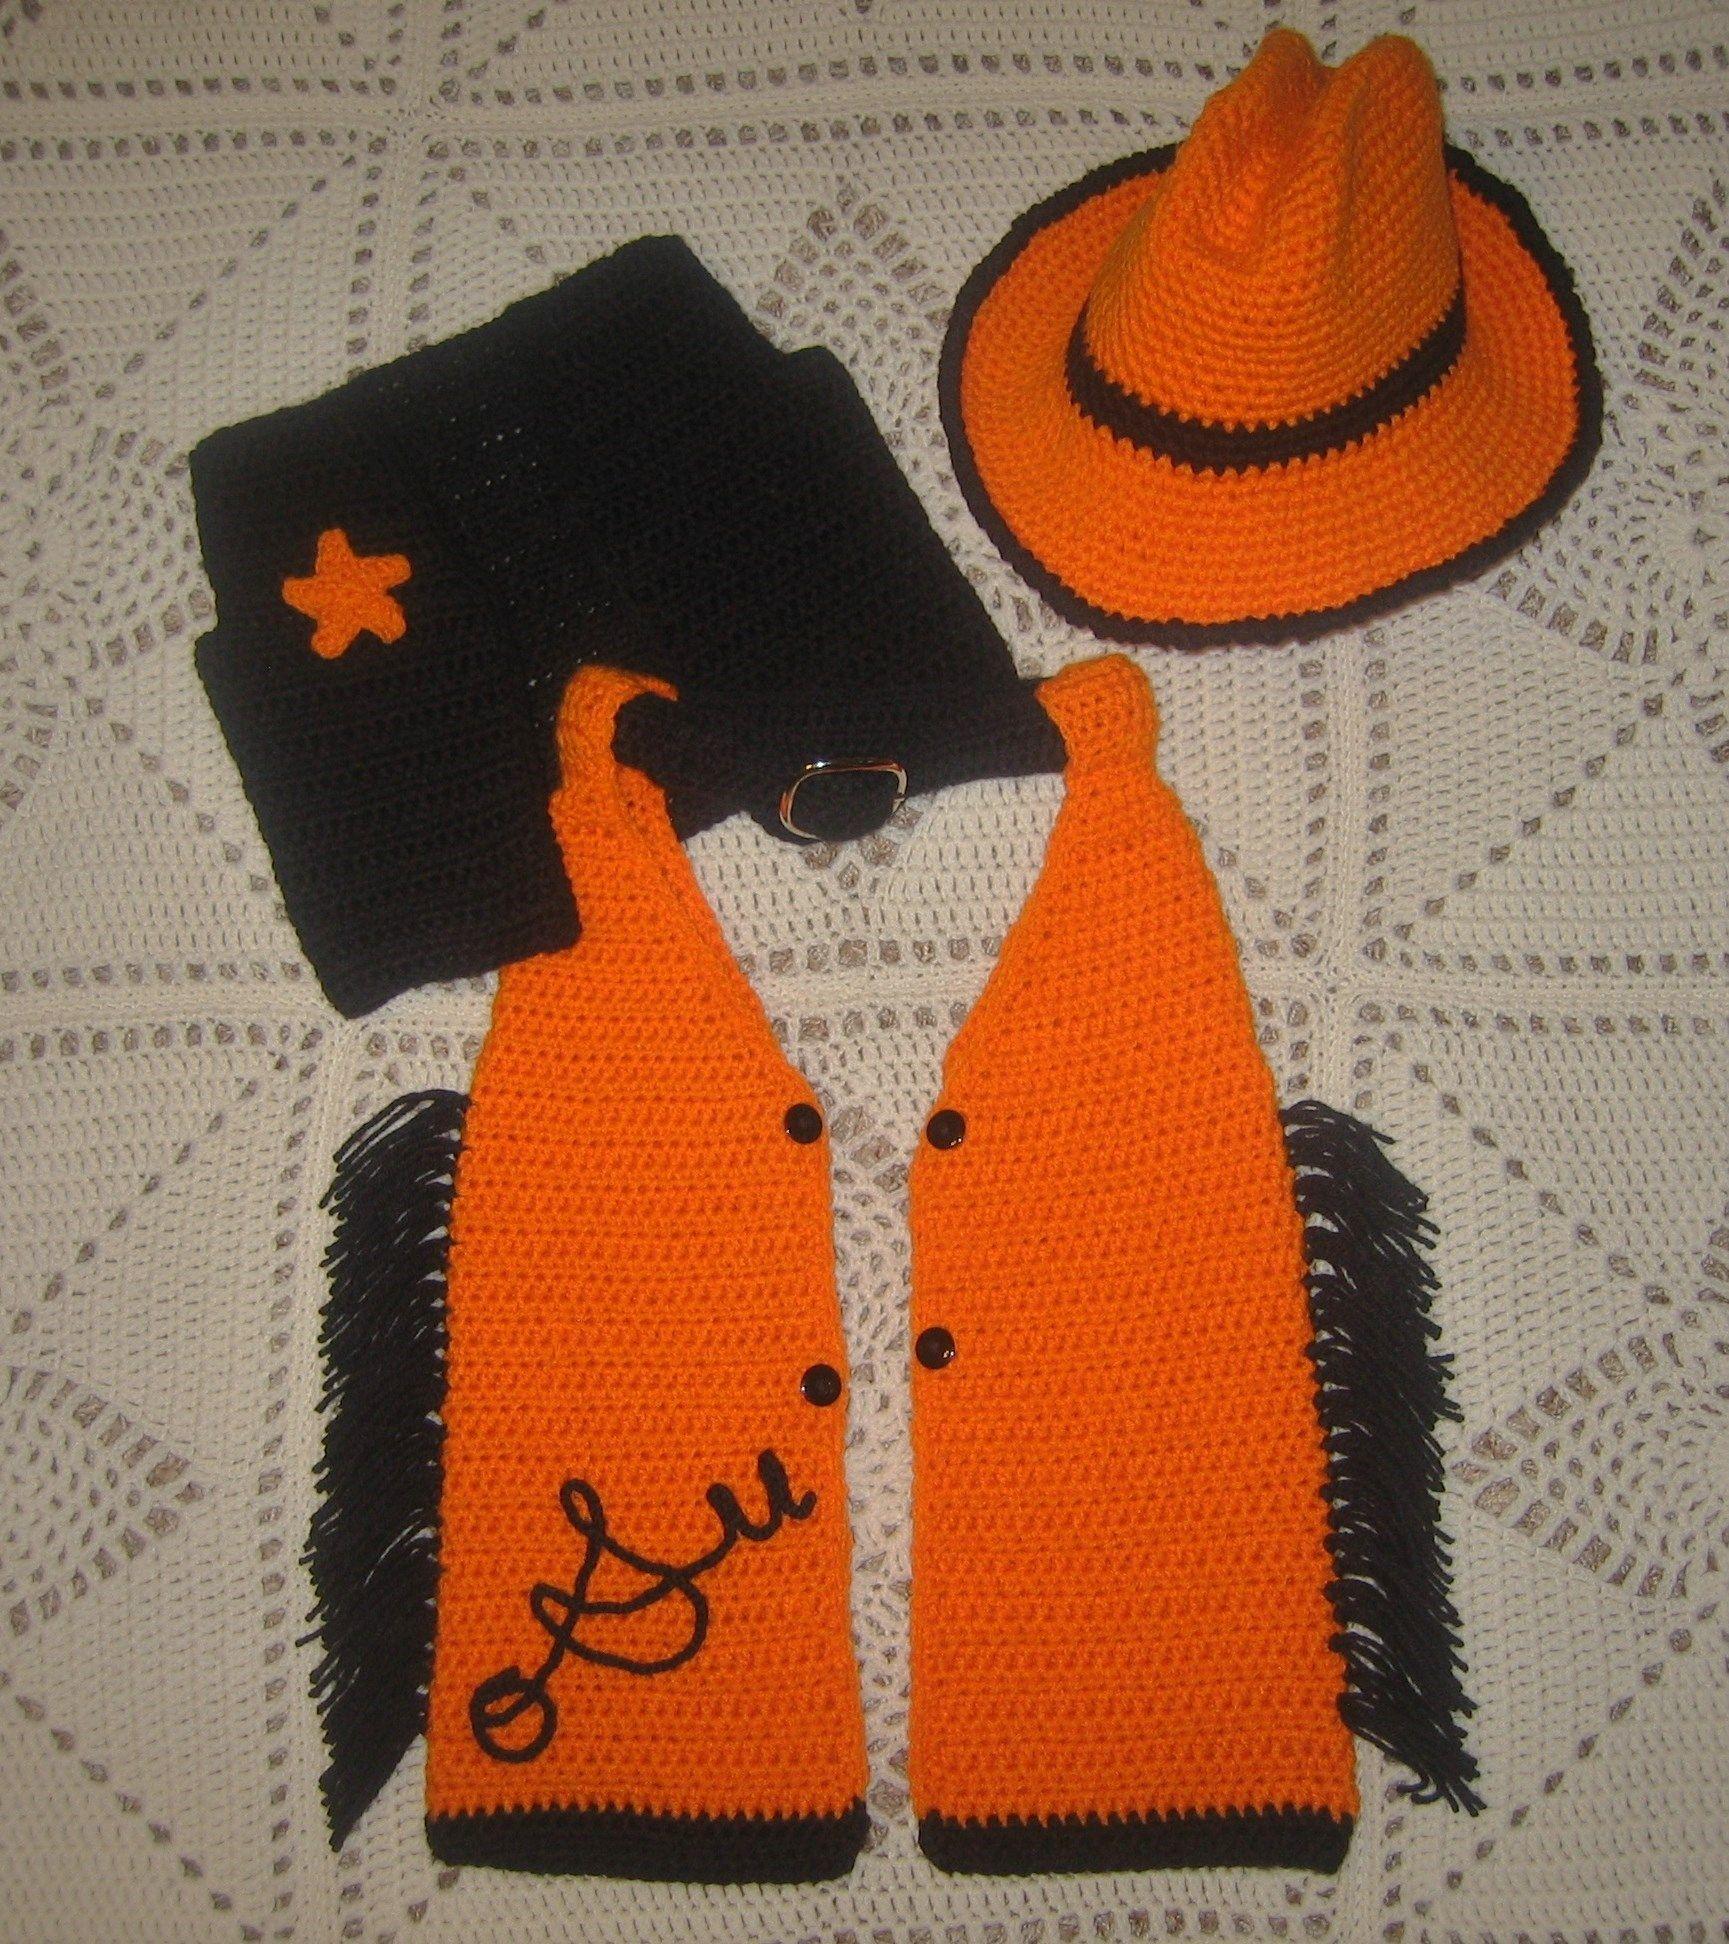 crochet pistol pete halloween costume. fringed chaps, vest and